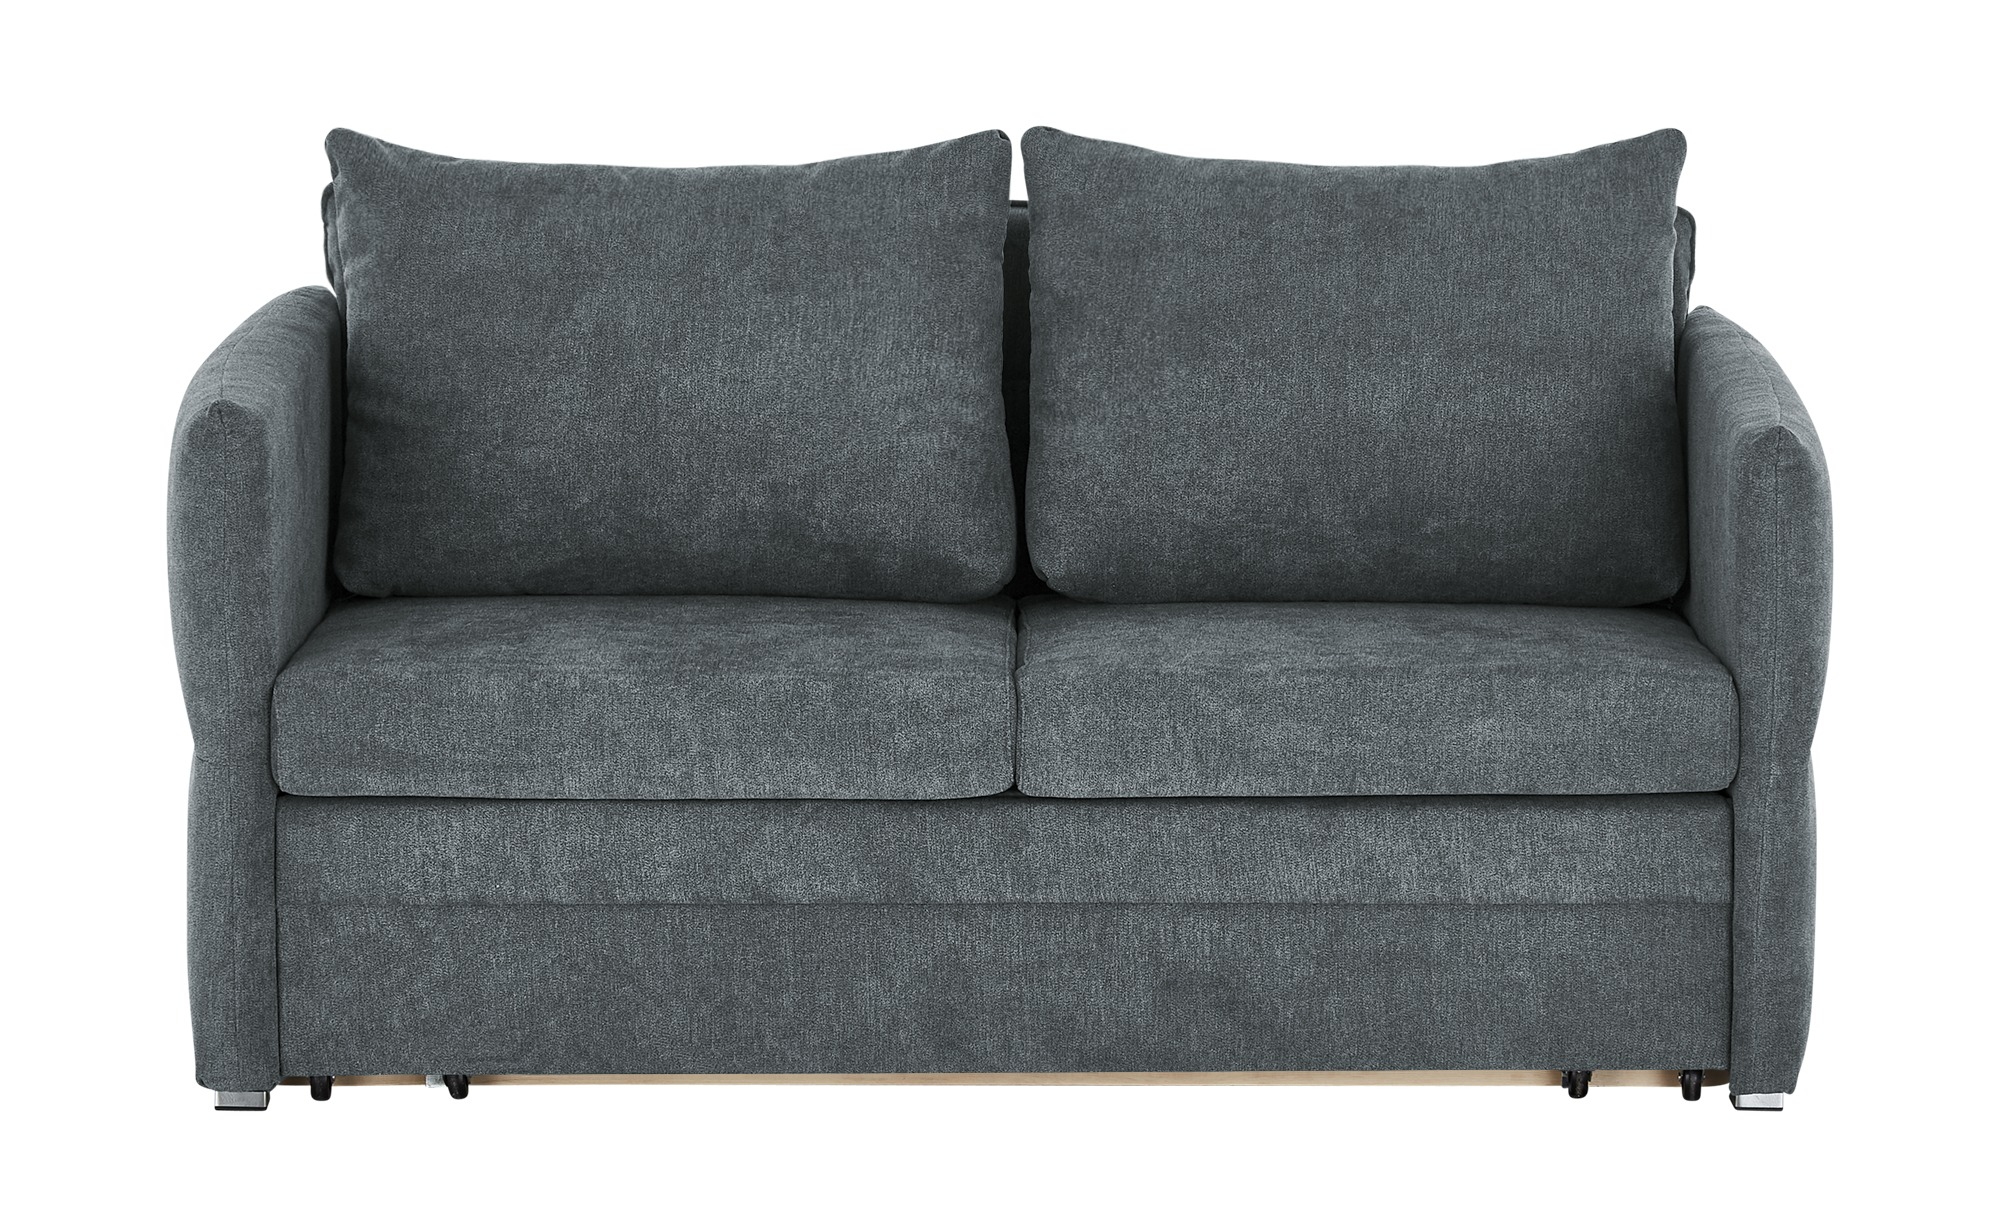 Schlafsofa  Lennox ¦ grau ¦ Maße (cm): B: 160 H: 88 T: 91 Polstermöbel > Sofas > 2-Sitzer - Höffner